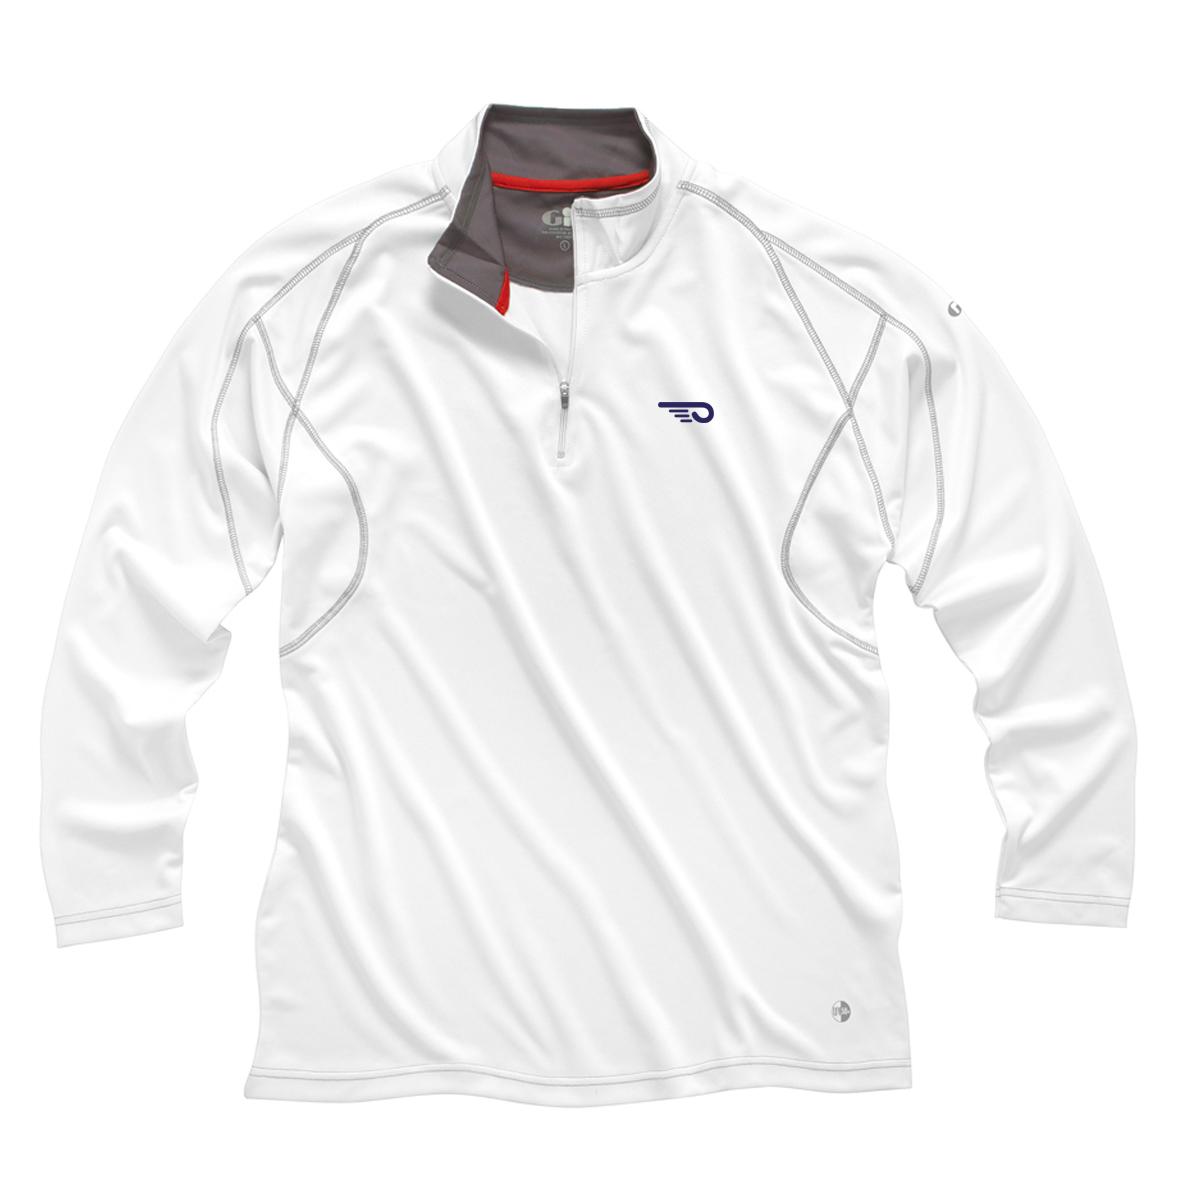 Hinckley Yachts- W's Gill 1/4 Zip UV Tech Shirt